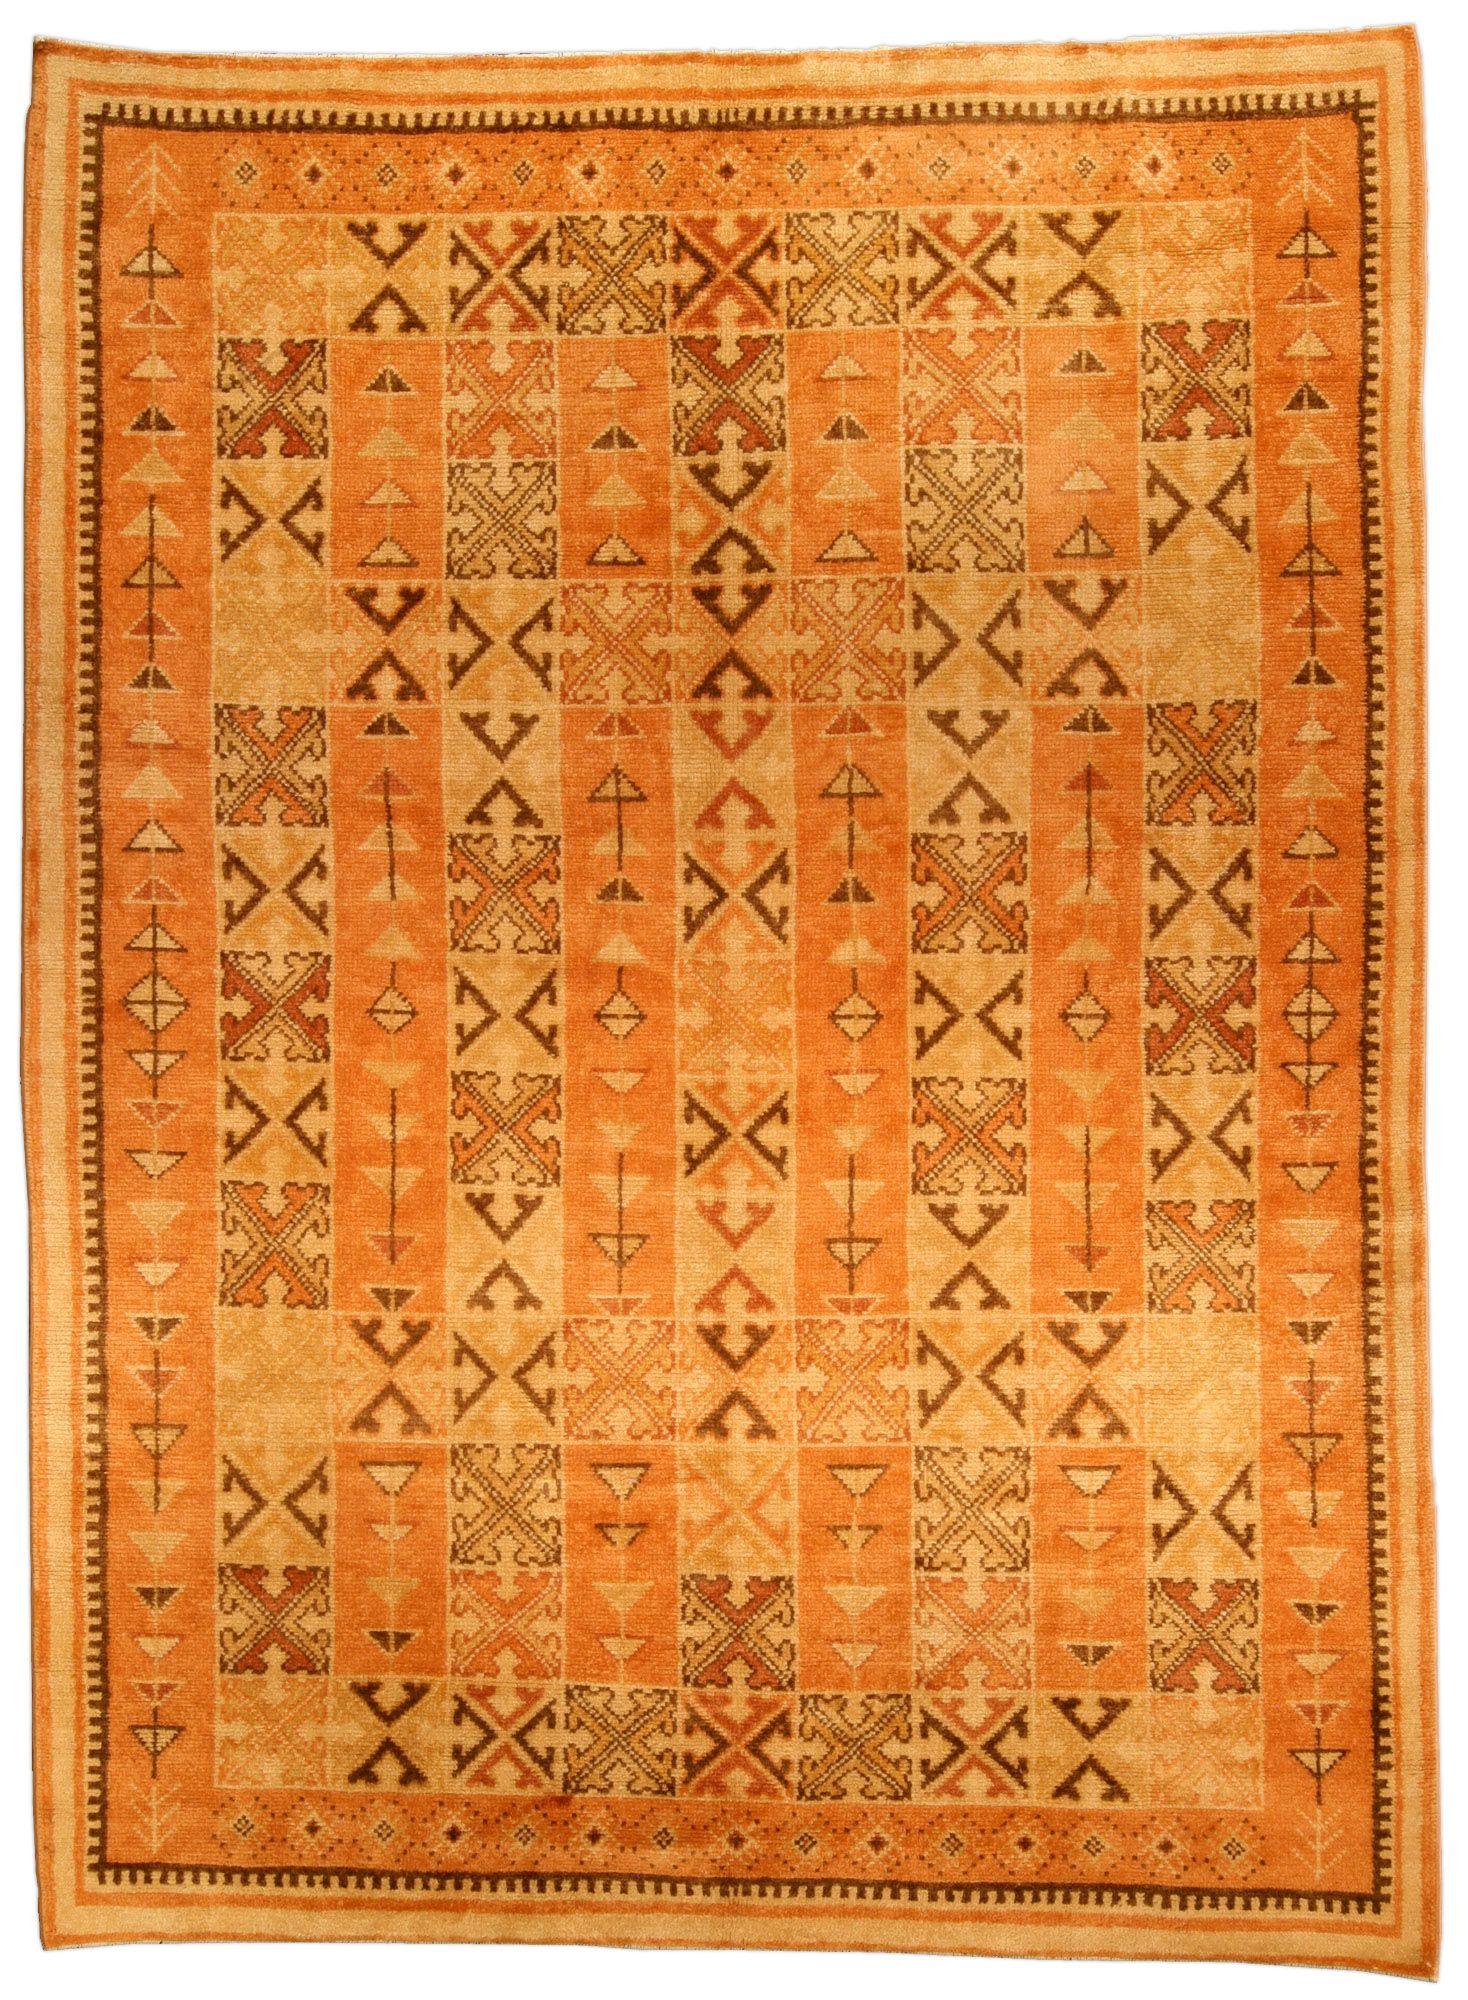 A Moroccan Carpet Bb4490  A Mid 20Th Century Tile